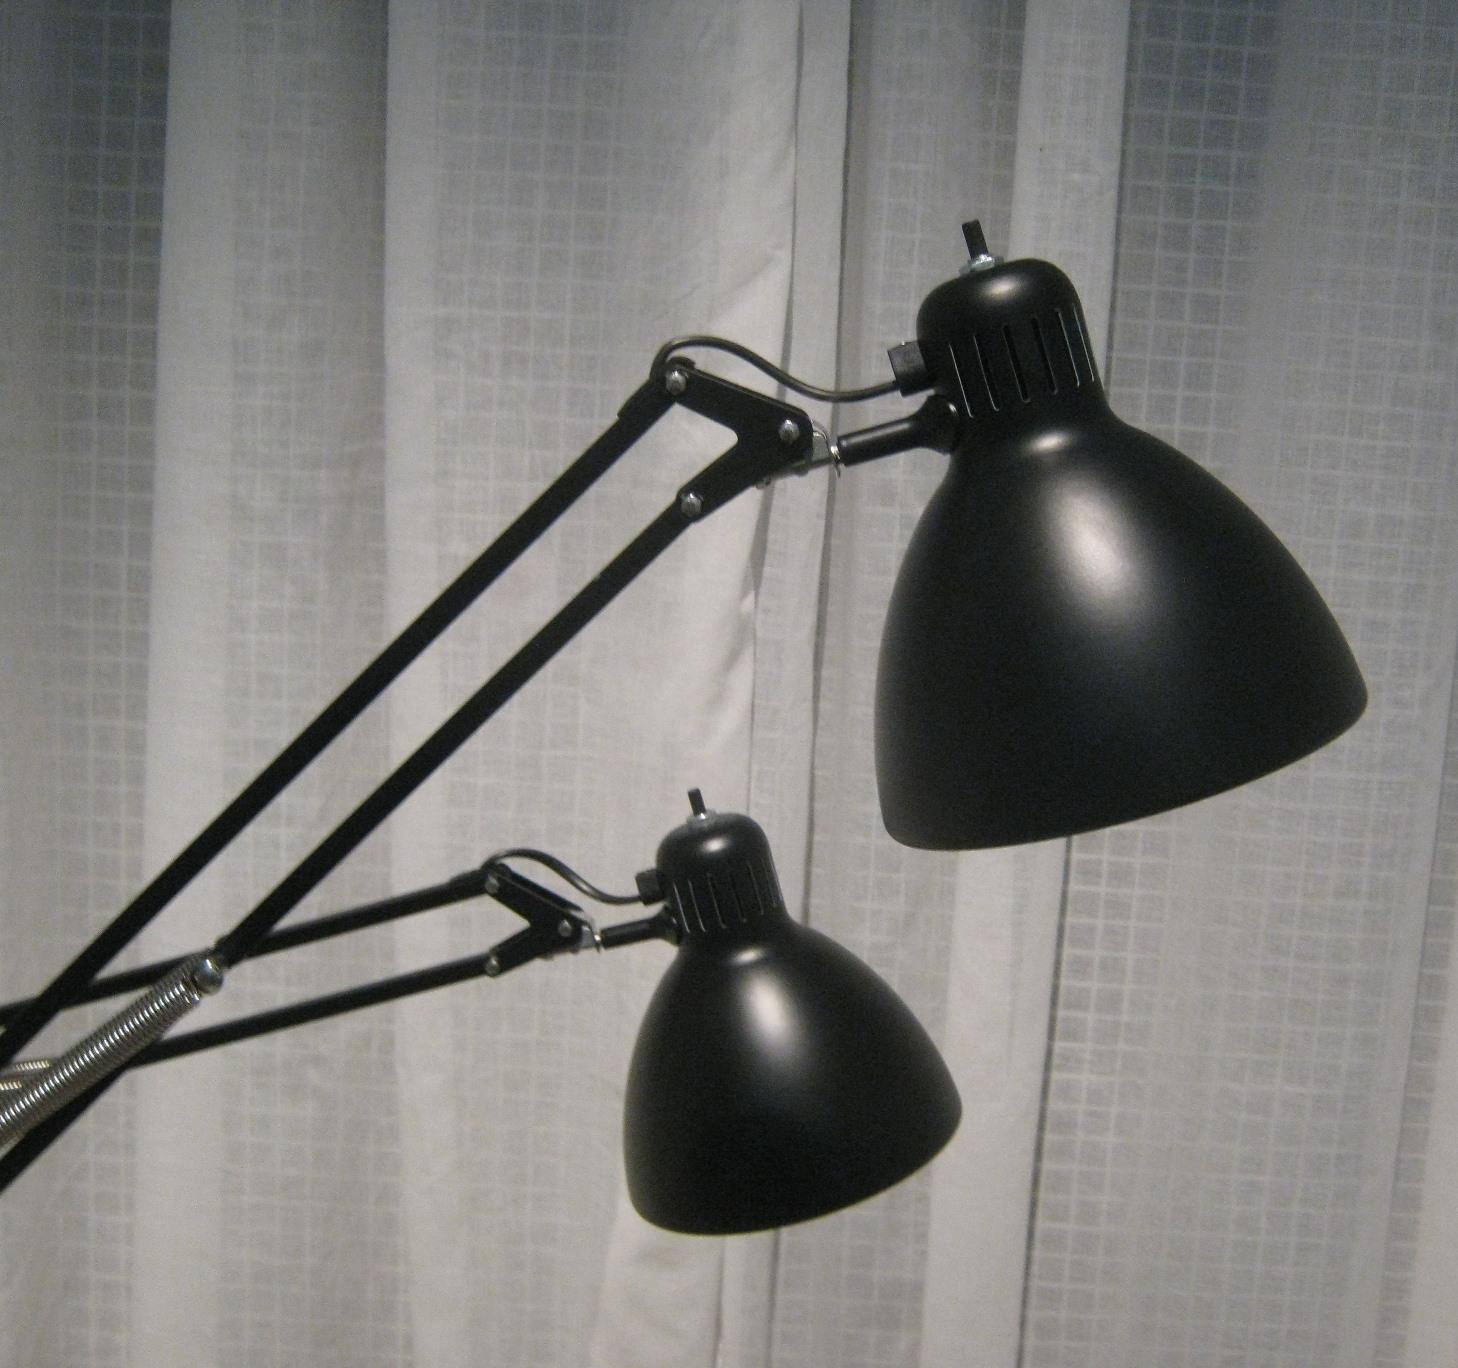 Lampada Da Tavolo Naska : Lampada da tavolo naska loris idee per il design della casa